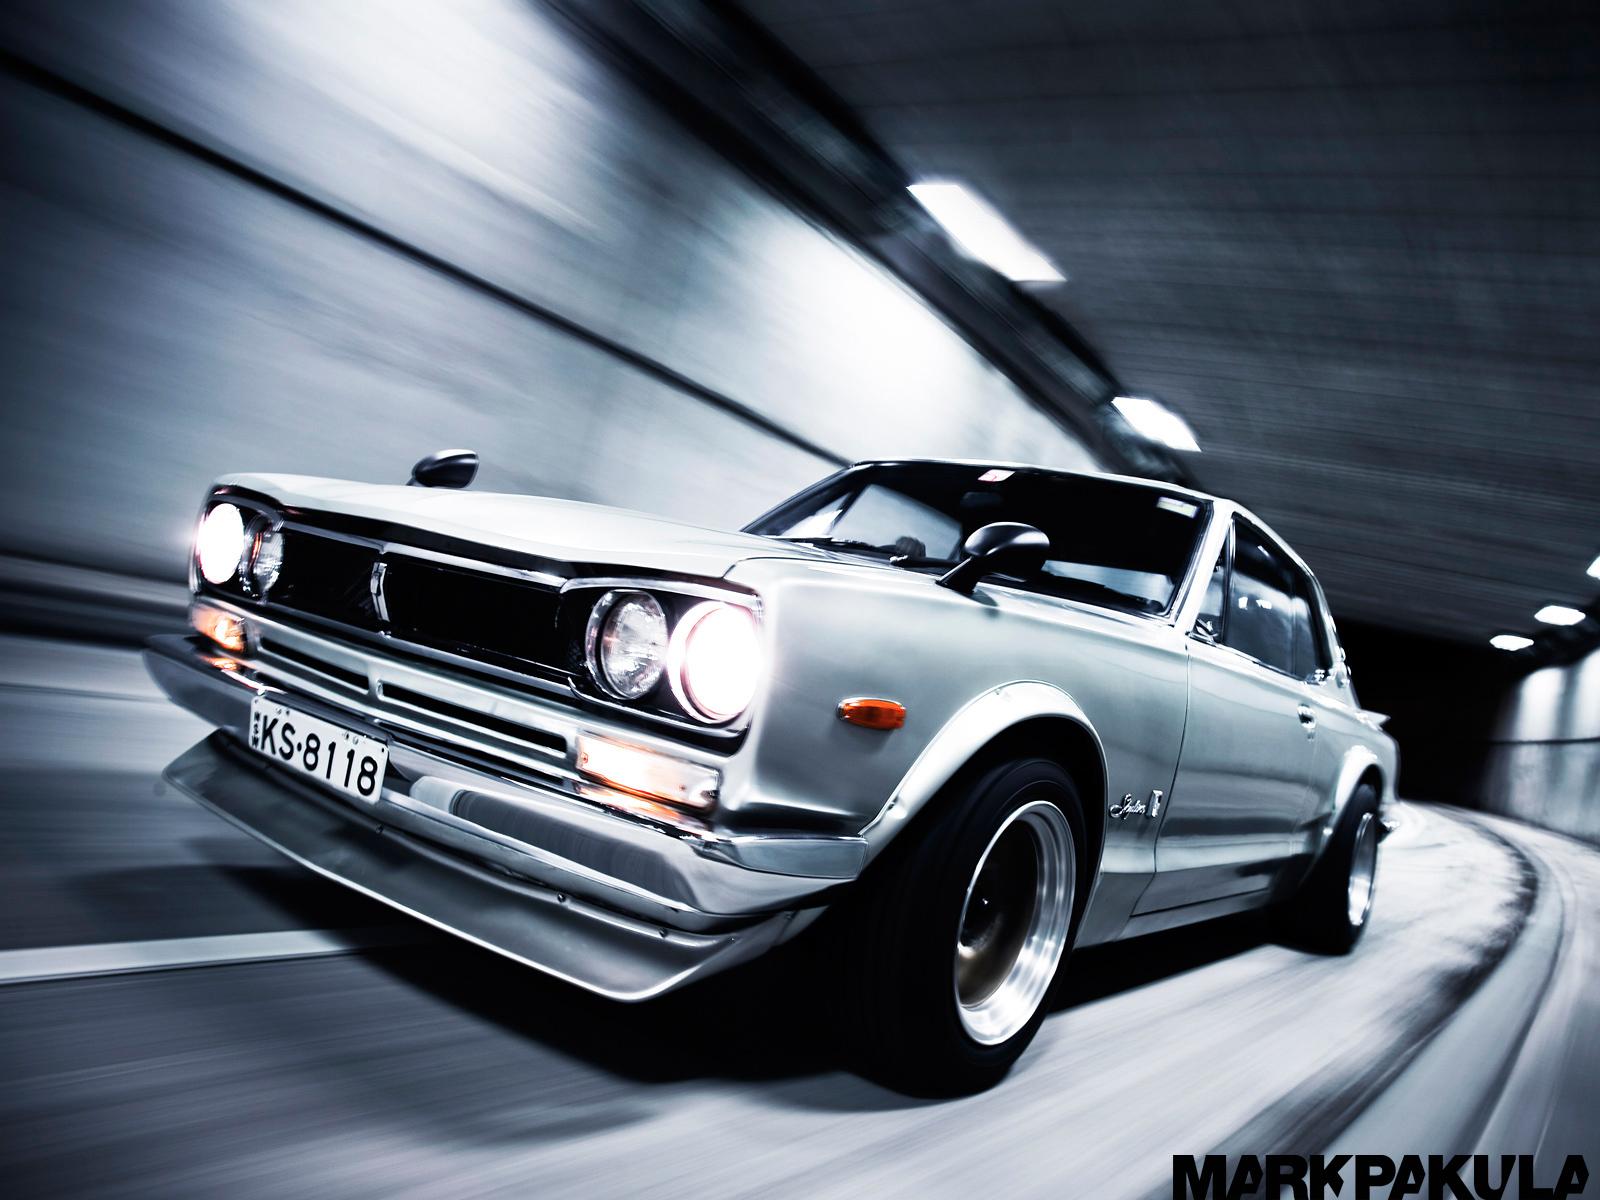 Wednesday Wall Jnc Project Hako Kgc10 Skyline Japanese Nostalgic Car